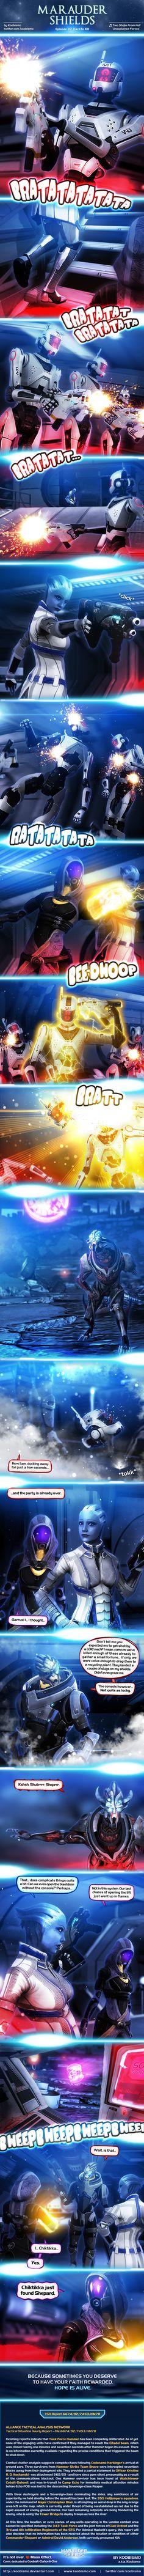 Marauder Shields 32: Hard To Kill (Mass Effect) by koobismo.deviantart.com on @DeviantArt